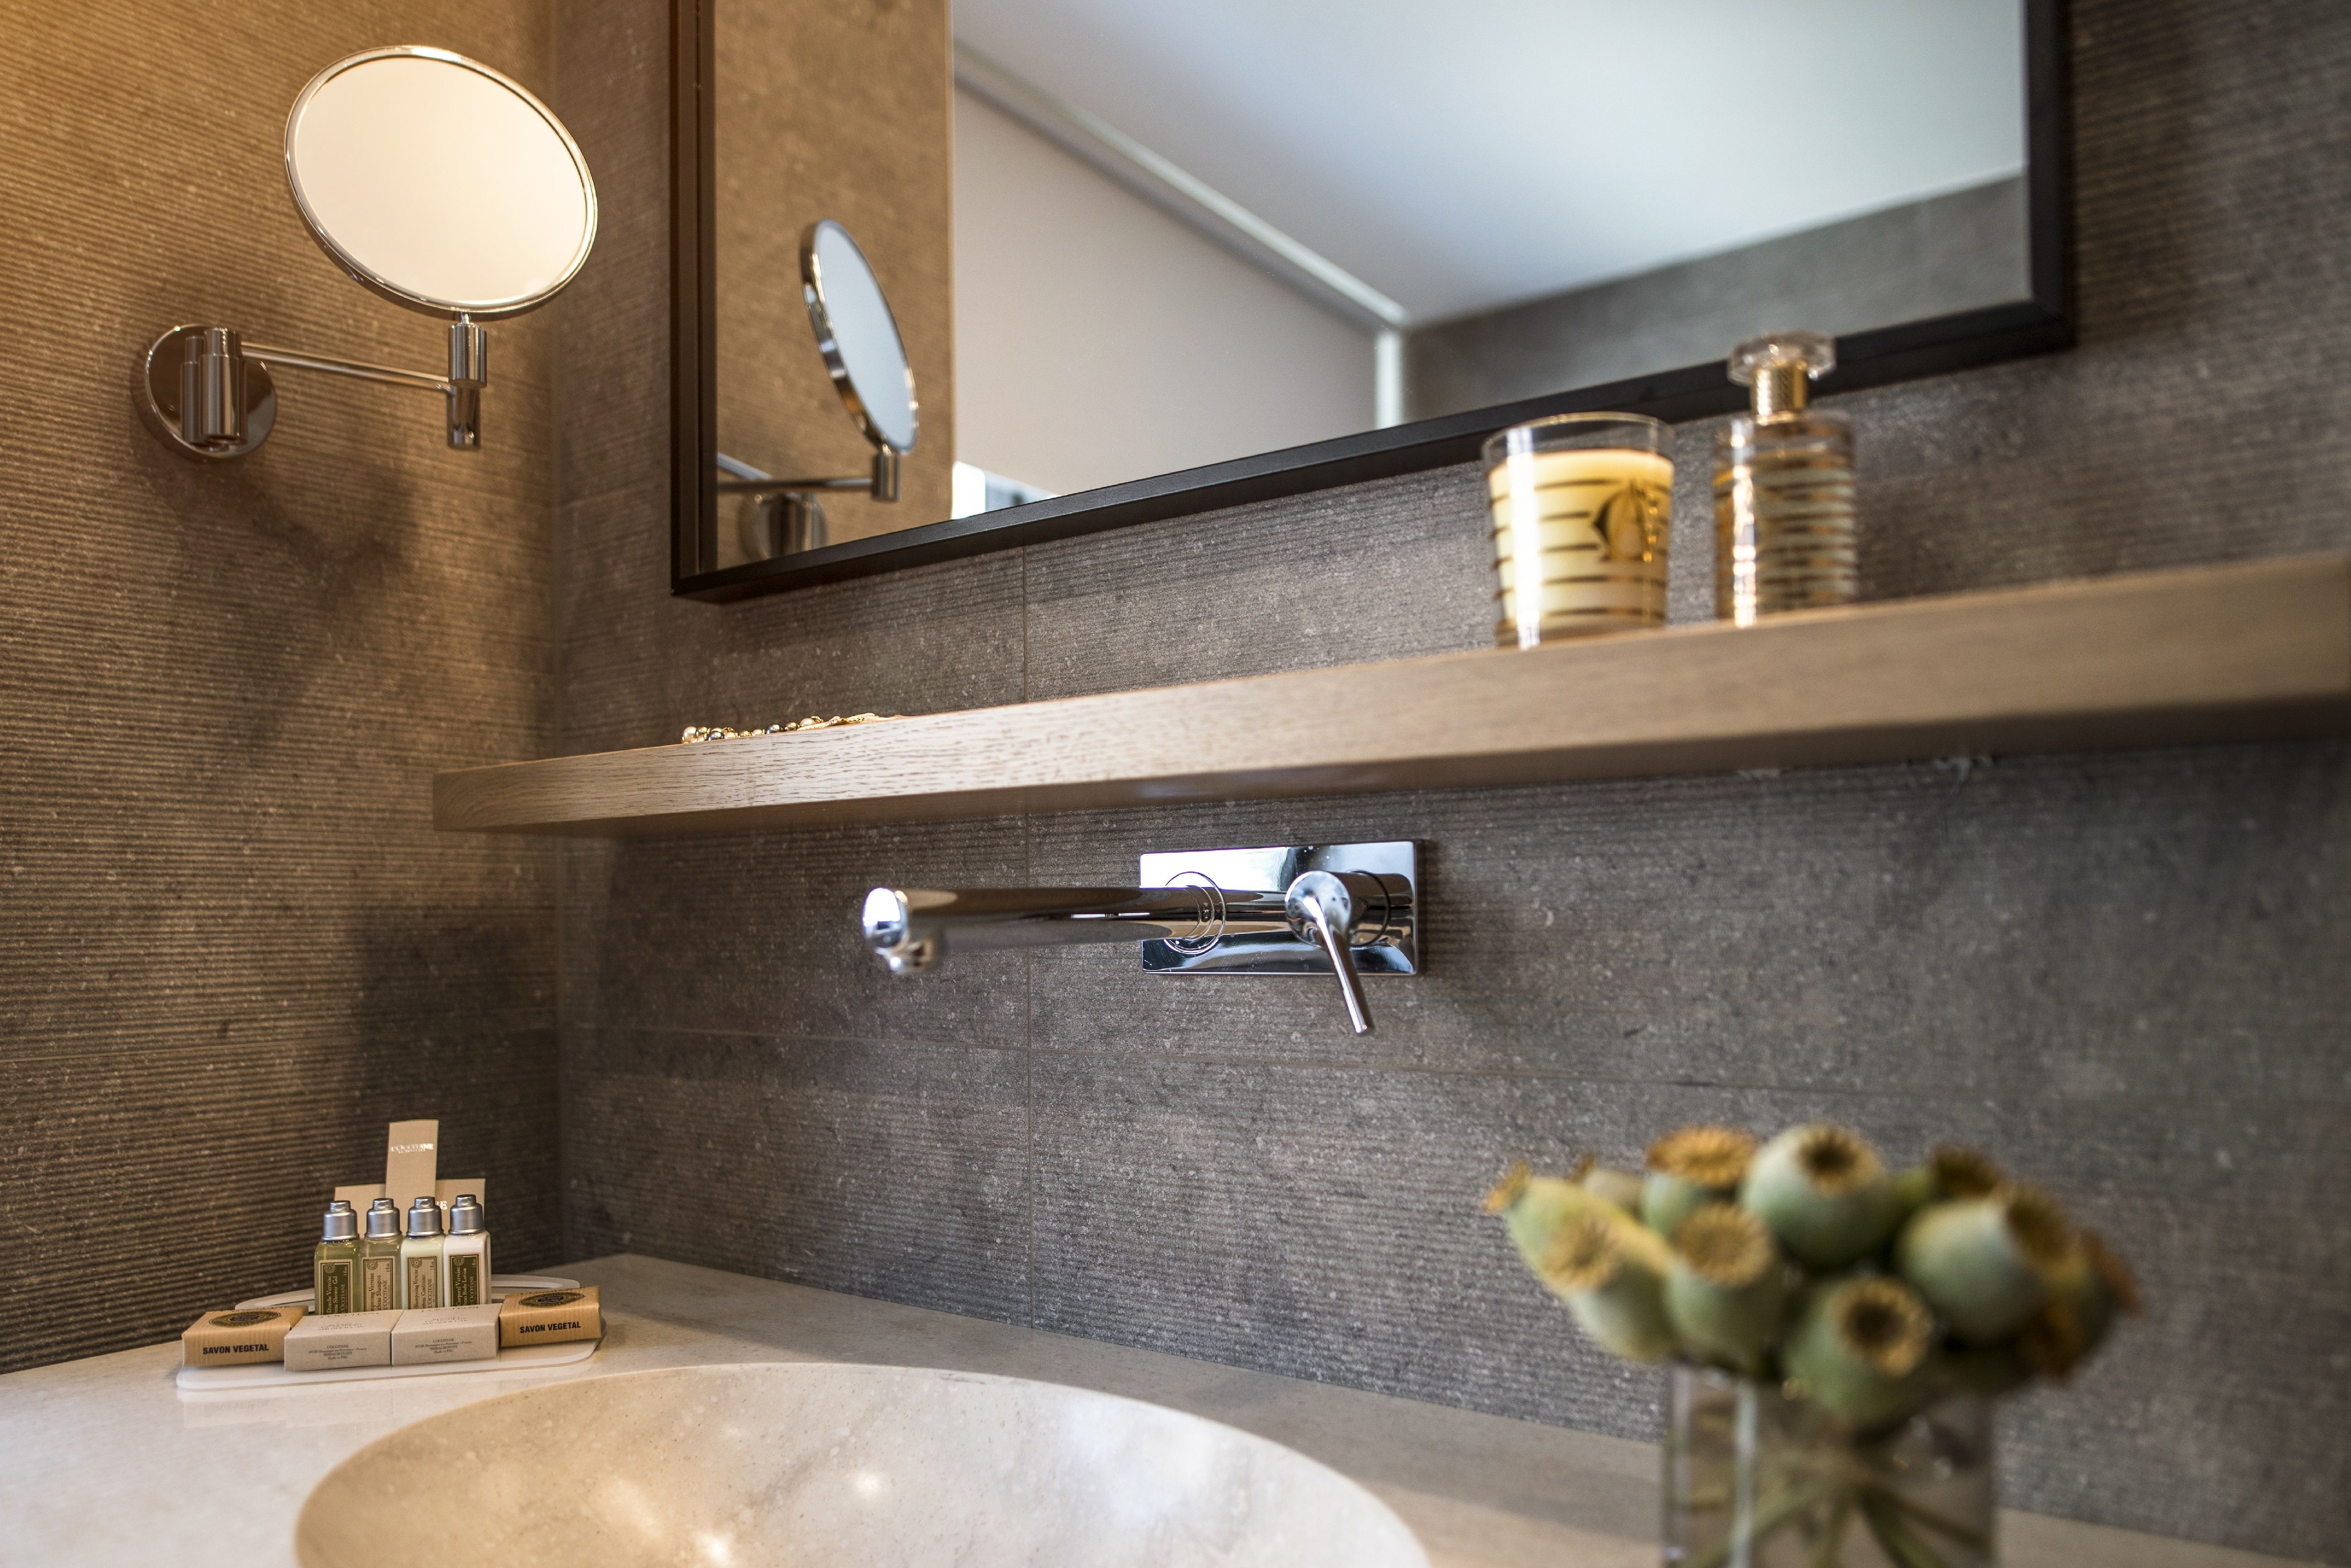 Bathromvanity Bathroomideas Bathroominspiration Hansgrohe Hansgrohe Bathroom Inspiration Luxury Hotel